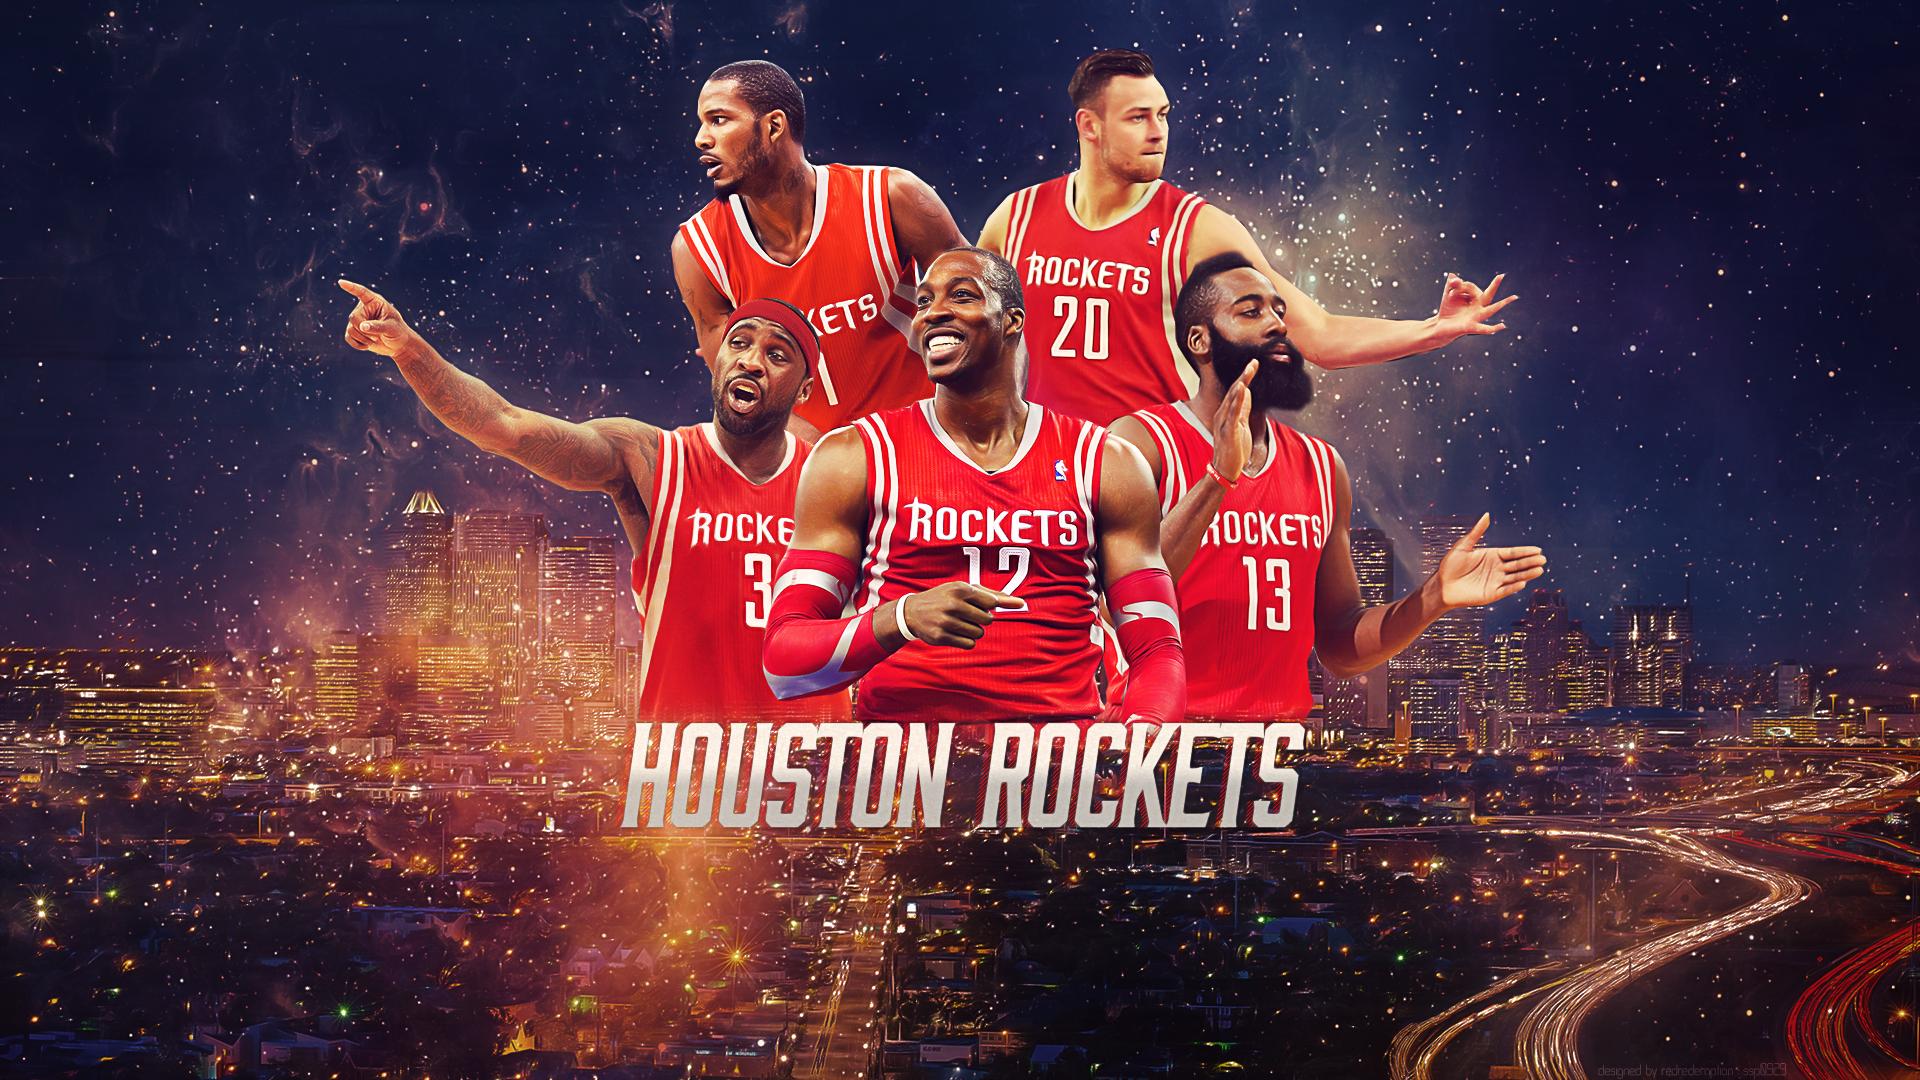 Wallpaper] Houston Rockets 2015 2016 Starting Lineup WP   ClutchFans 1920x1080